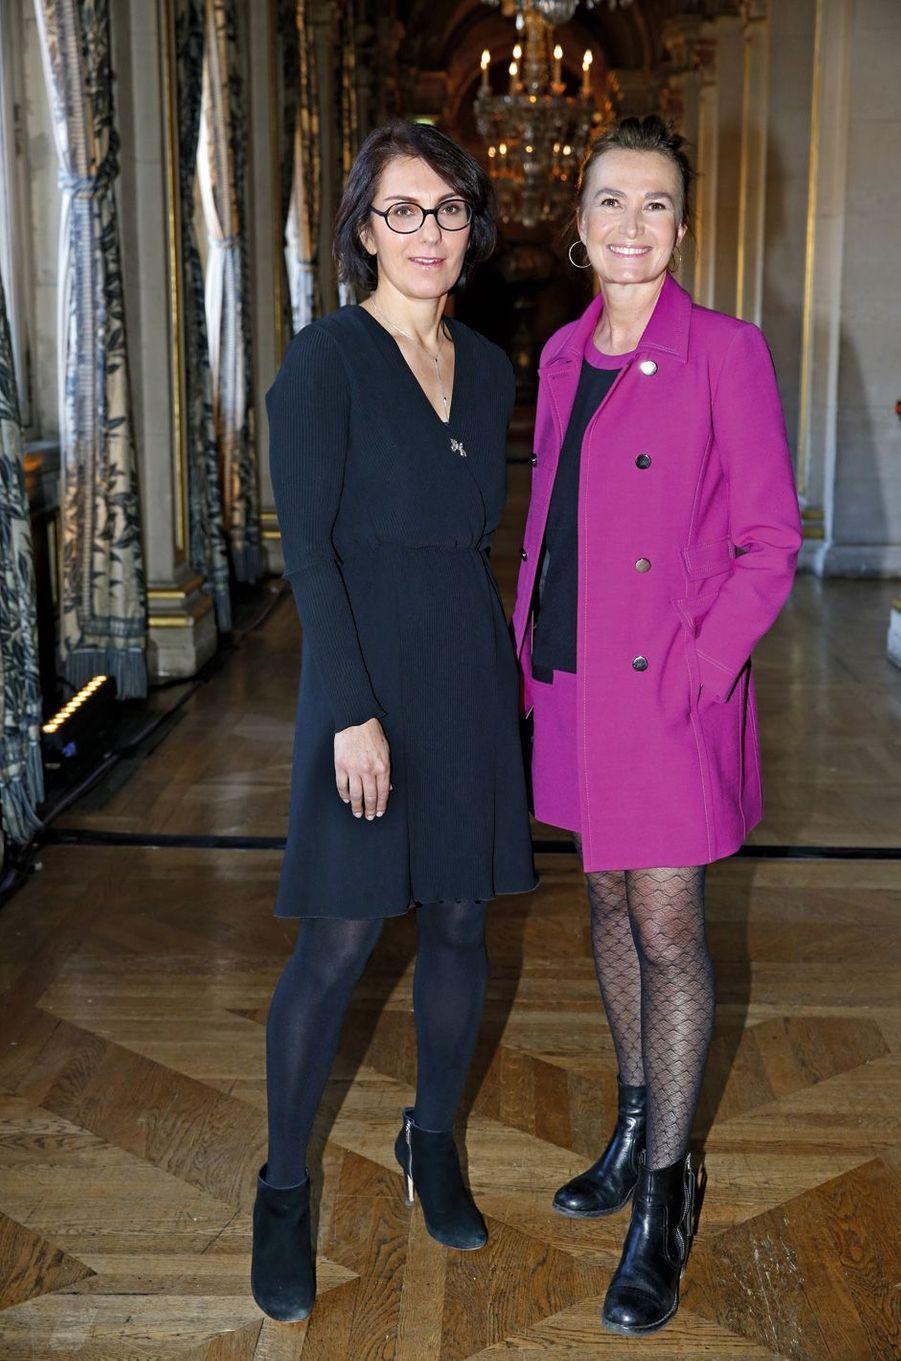 Nathalie Balla, Marie-Laure Sauty de Chalon